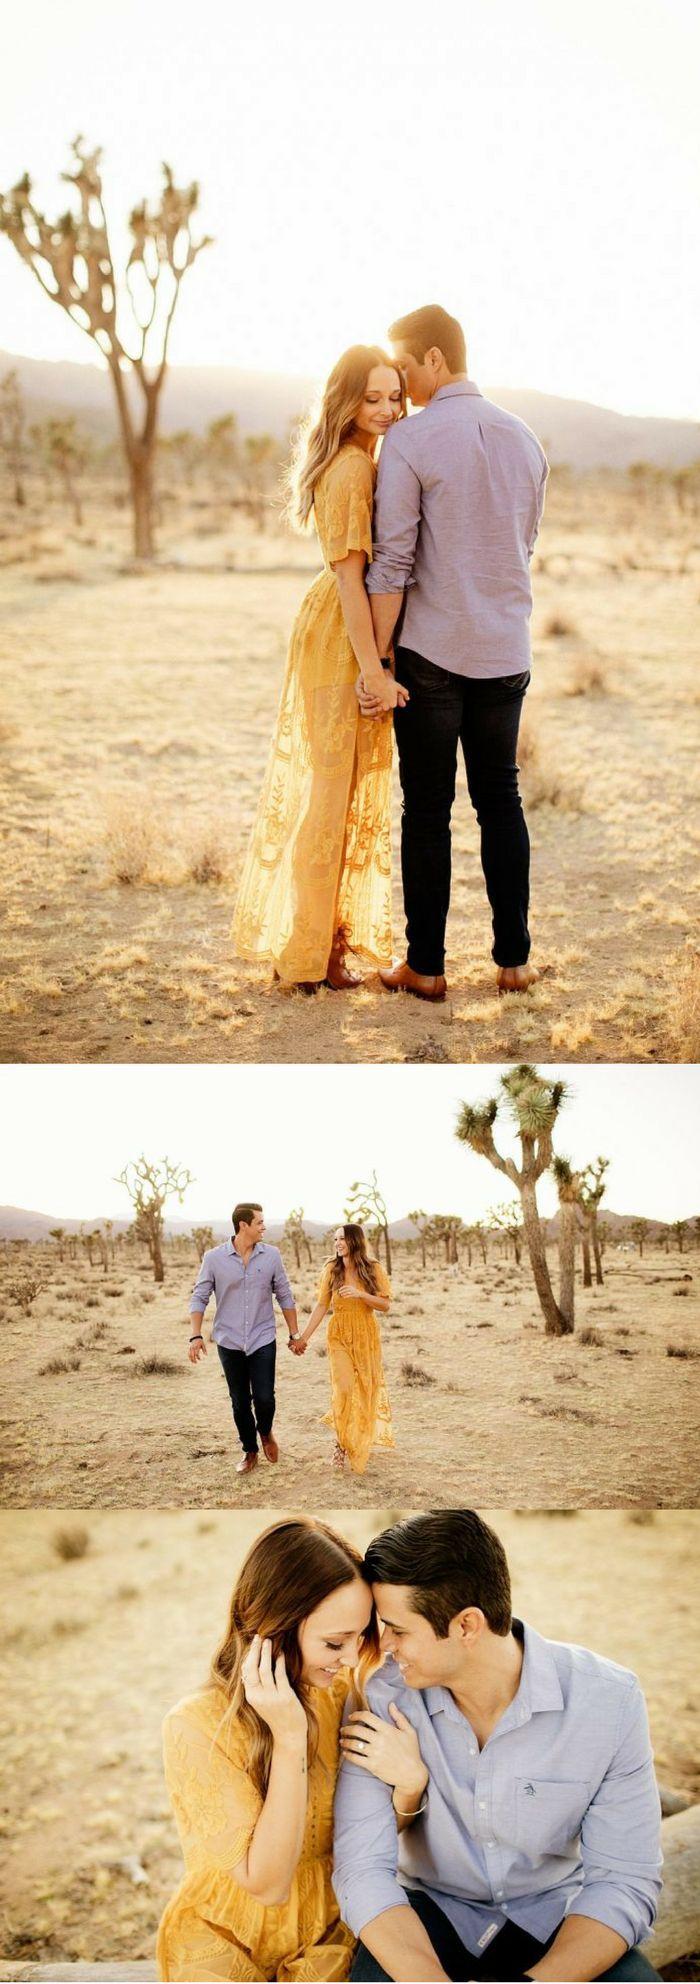 25+ best ideas about Engagement Photos on Pinterest ...